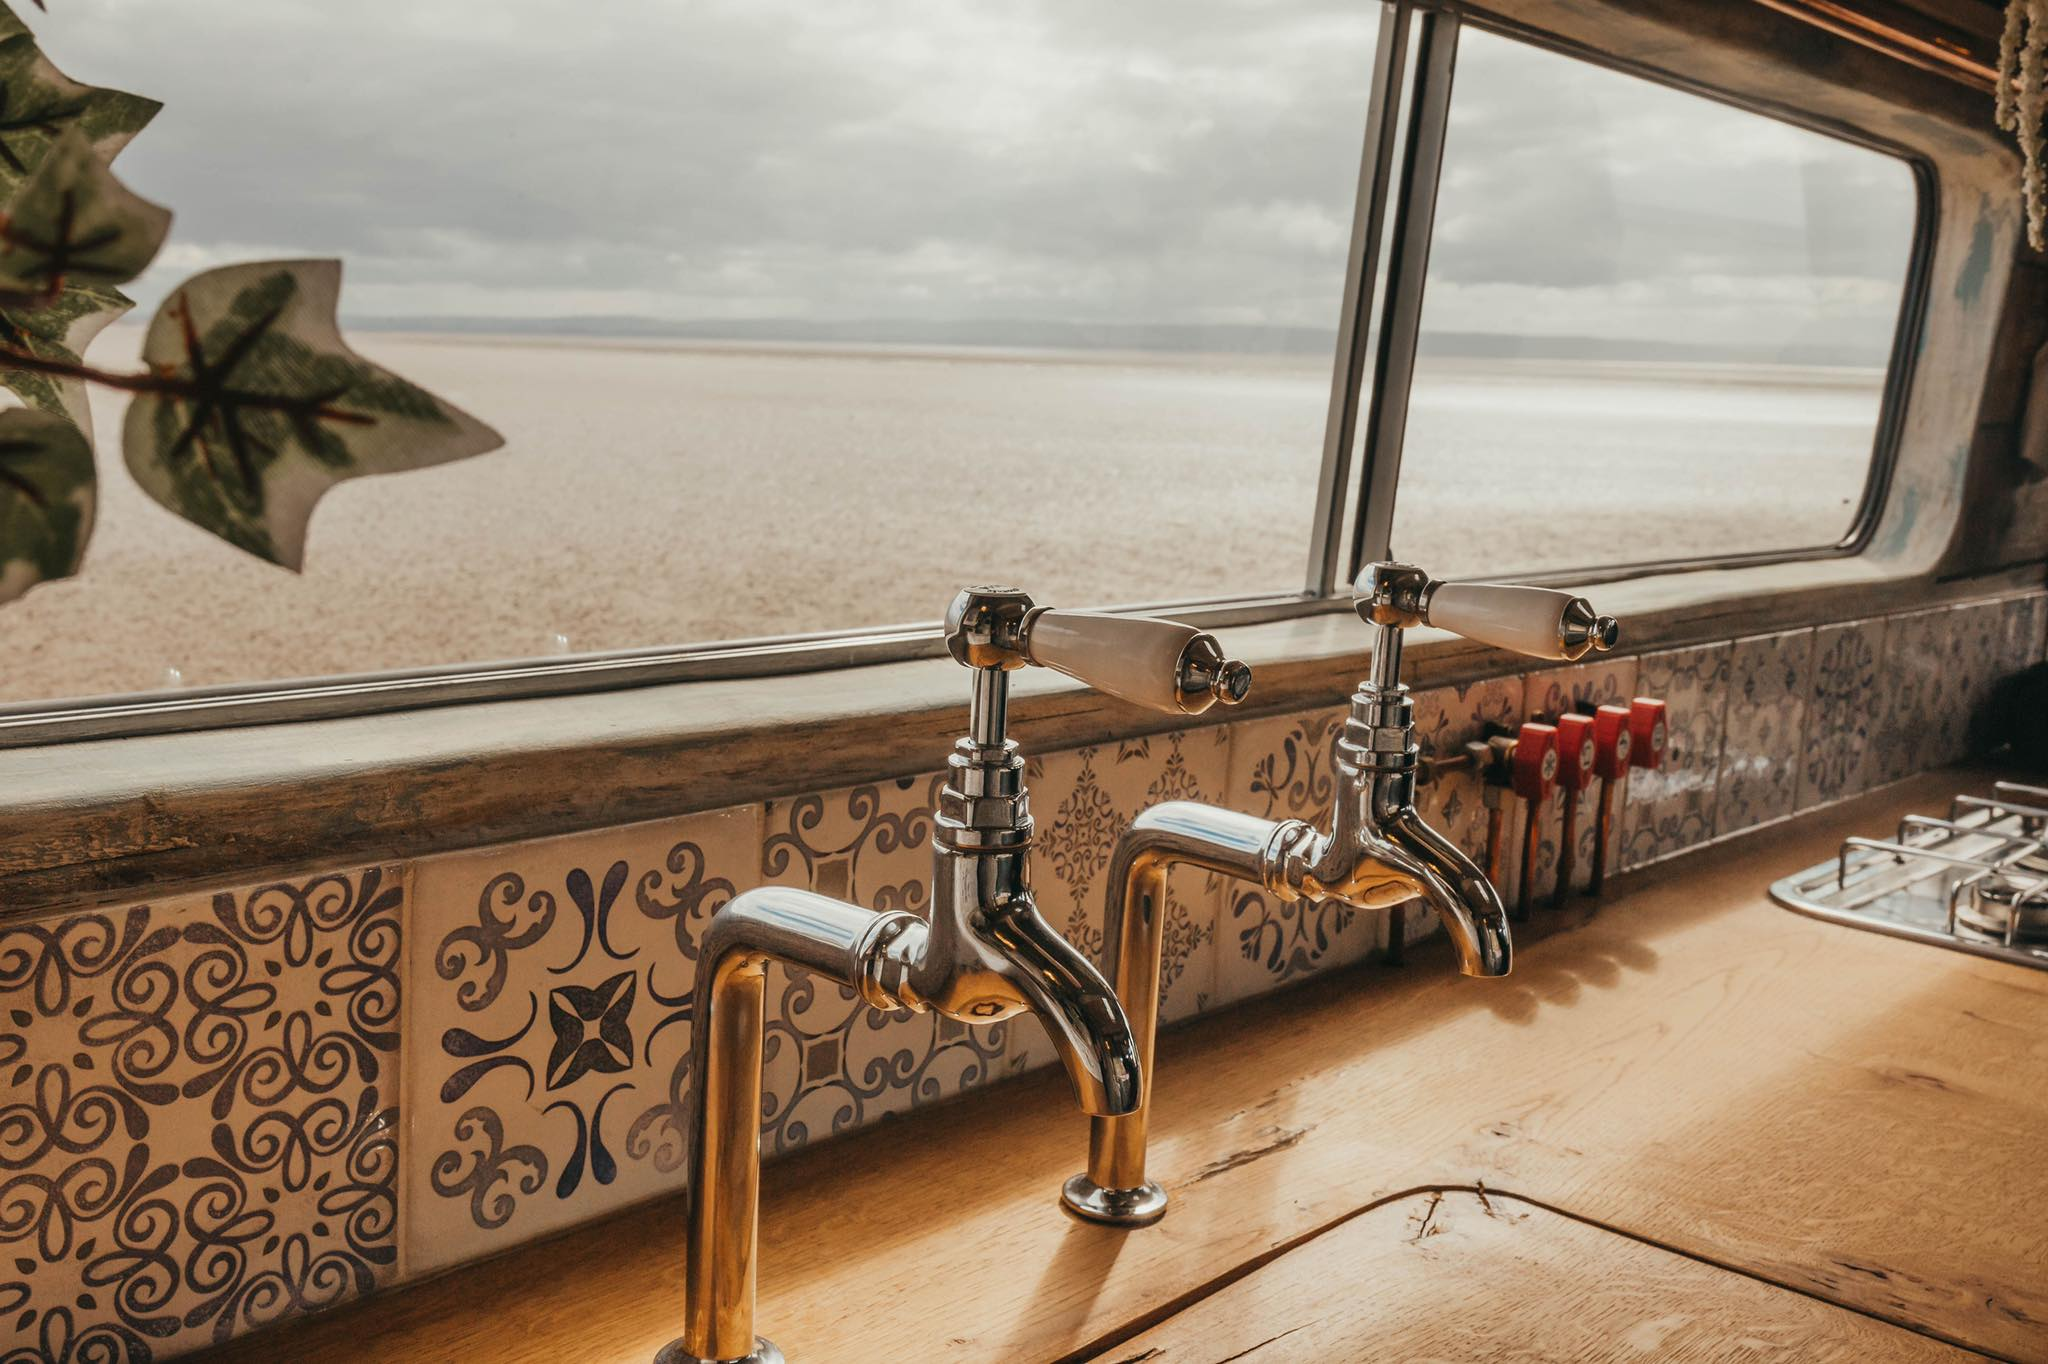 an interior view of Ernie the campervan kitchen overlooking a beach